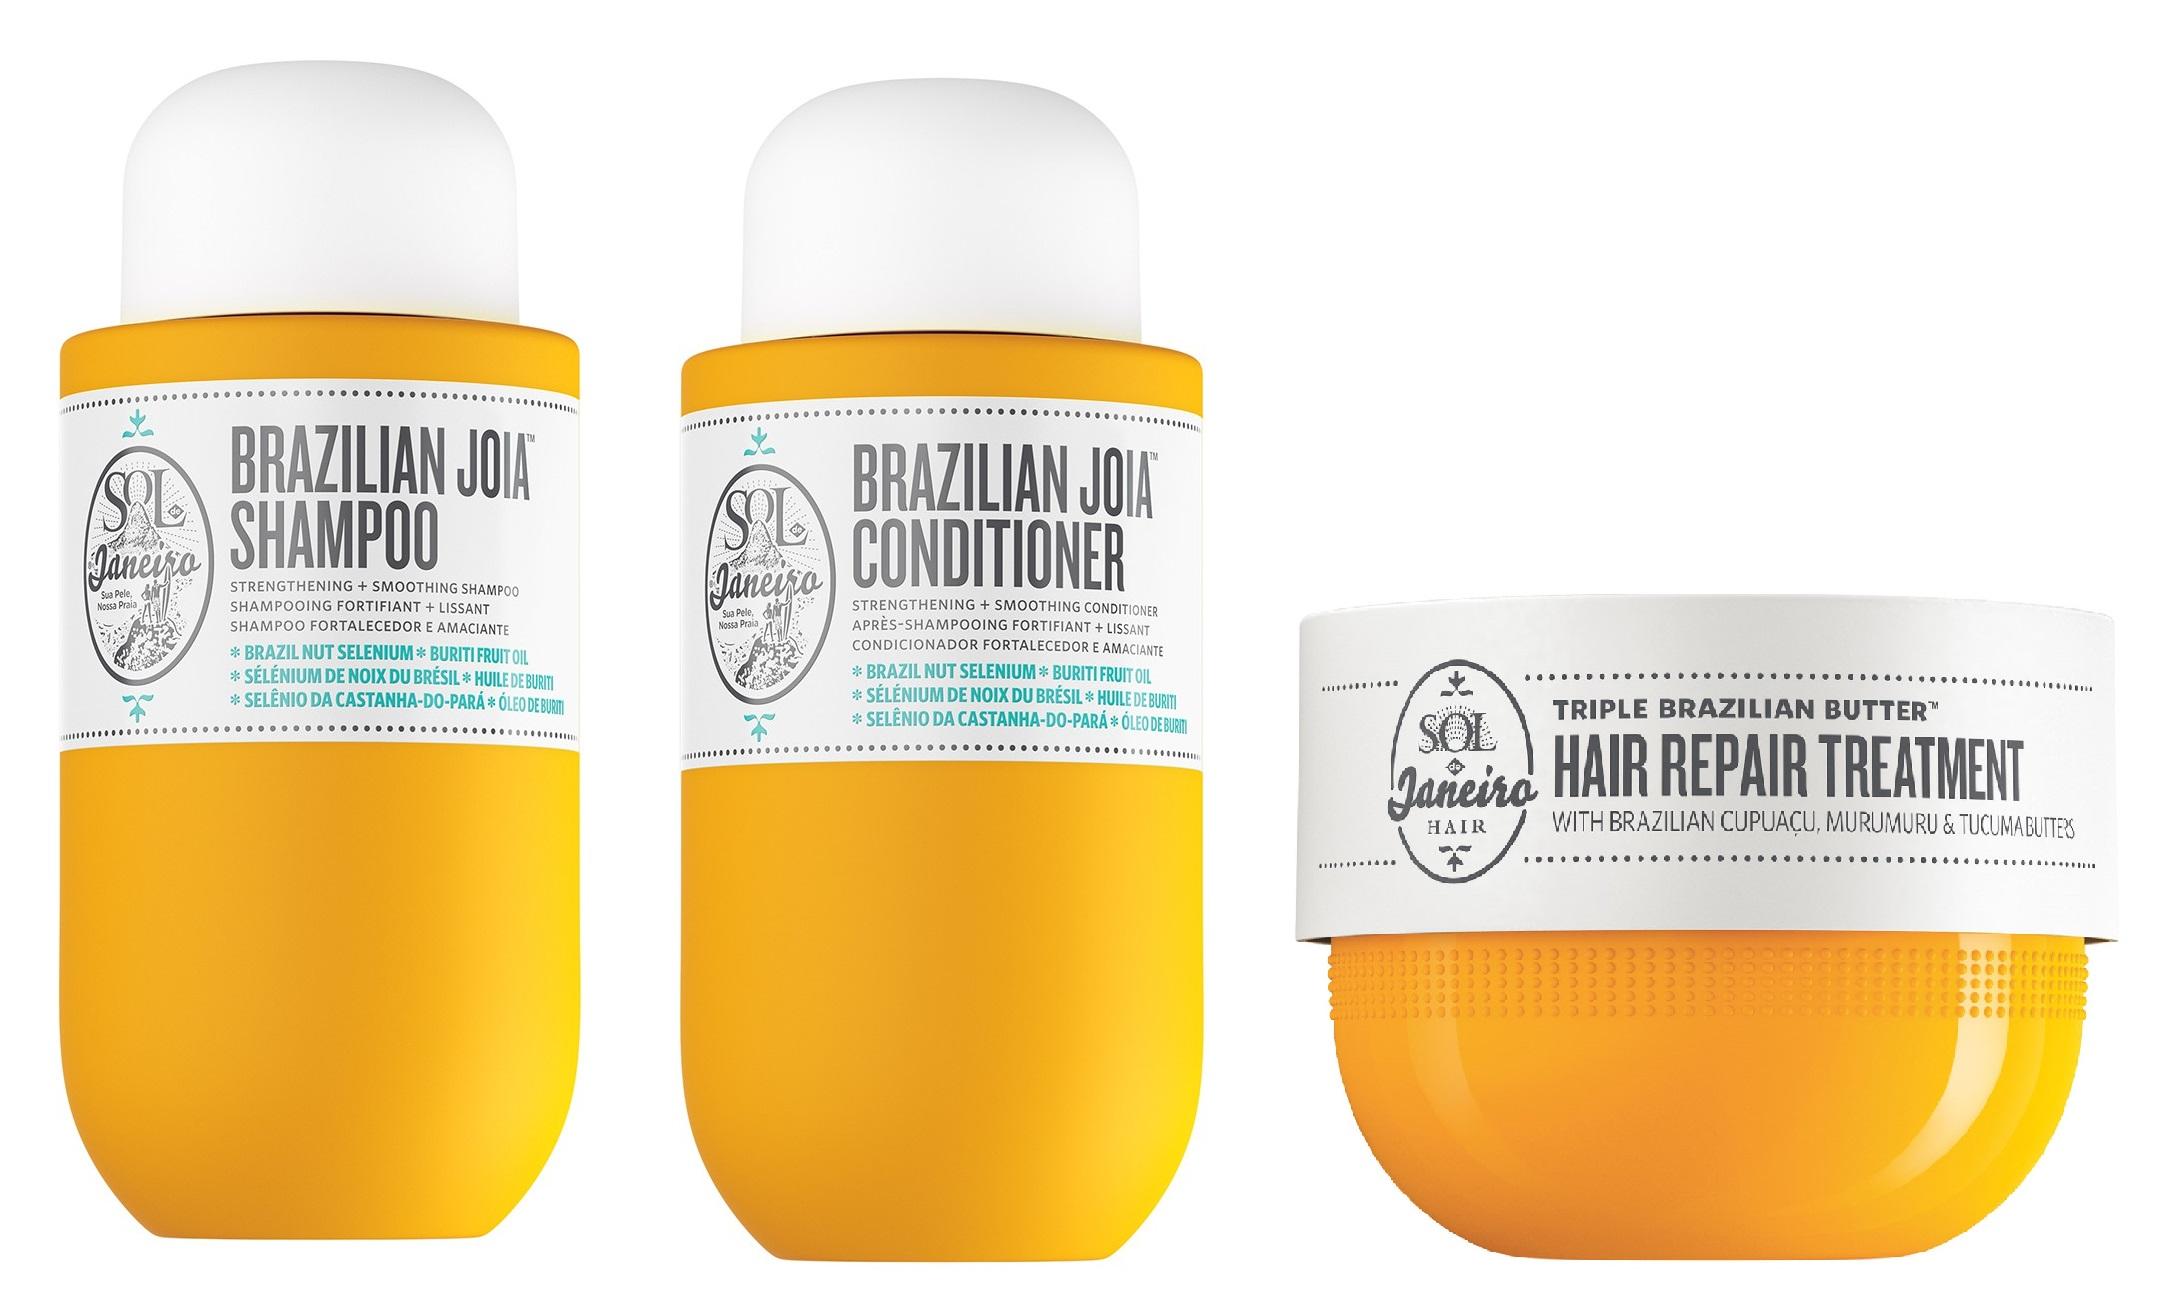 Sol de Janeiro - Brazilian Joia Strengthening + Smoothing Shampoo + Conditioner 295 ml + Triple Brazilian Butter Hair Repair Treatment 238 ml